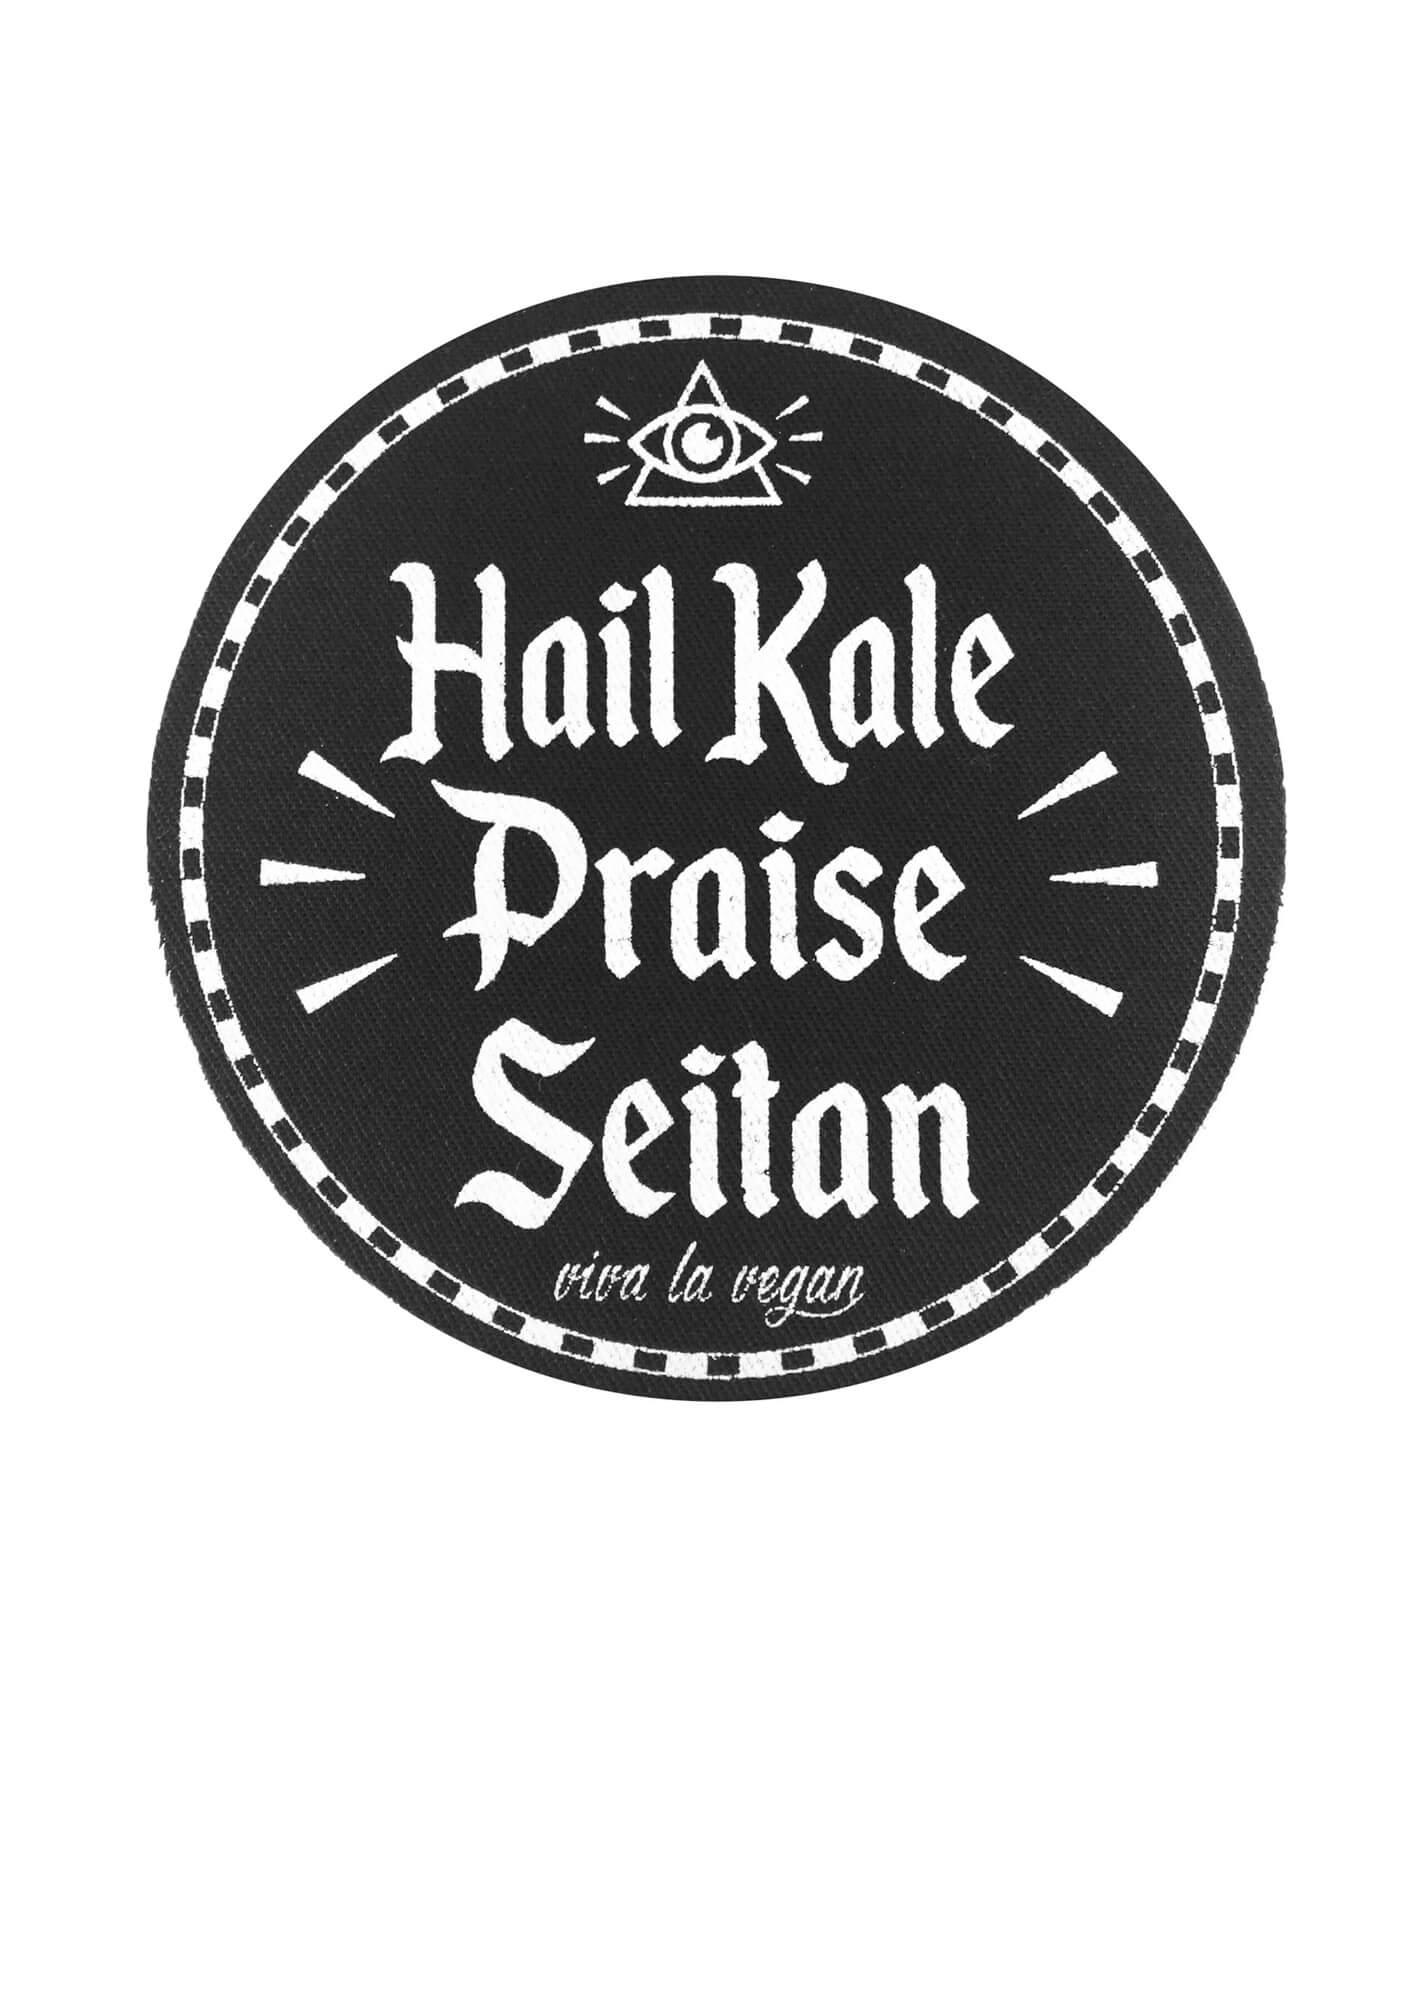 Printed Patch Round - Hail Kale Praise Seitan by eco ethical brand